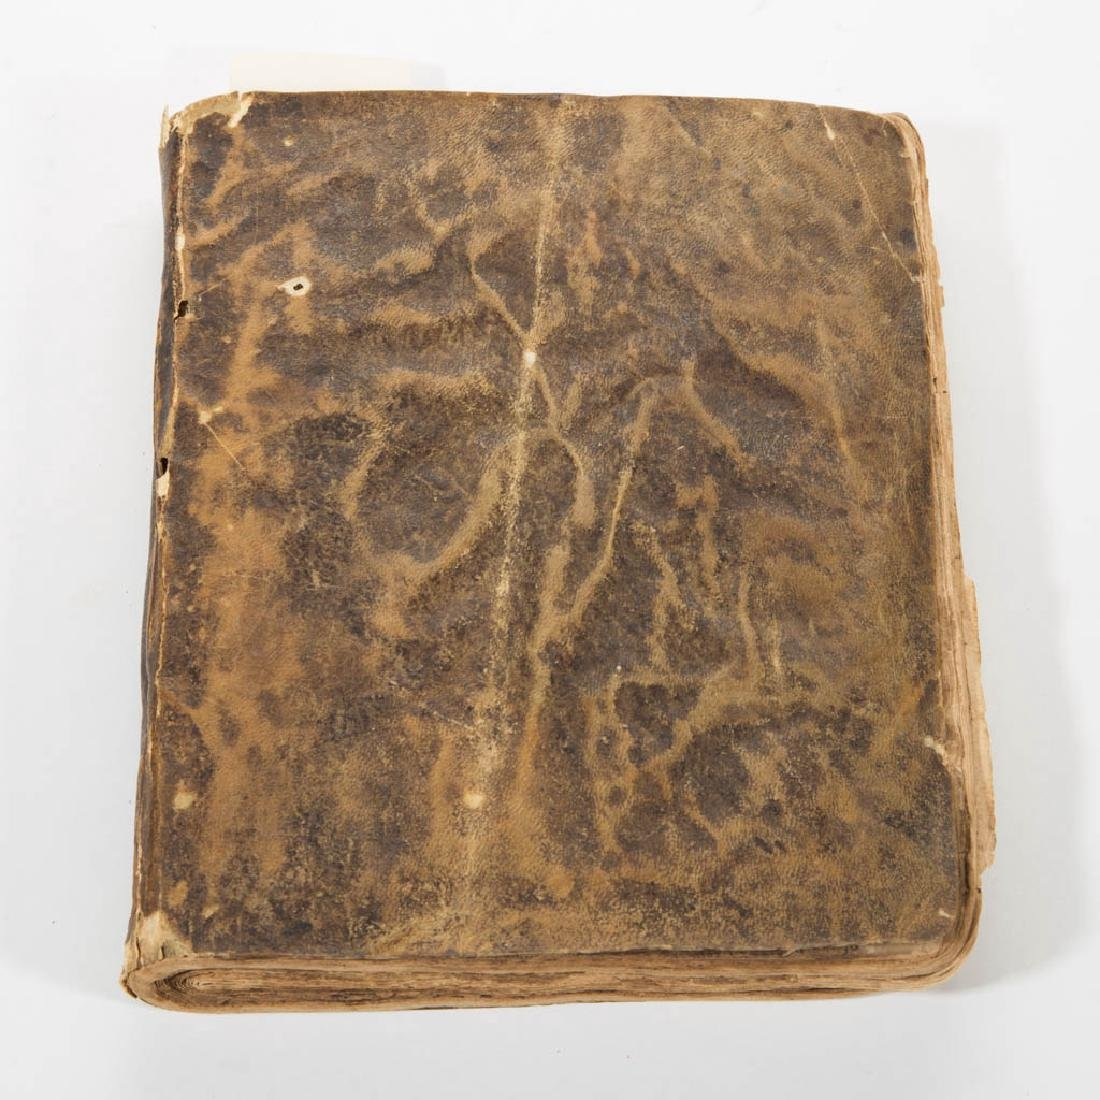 ENGLISH 18TH CENTURY MANUSCRIPT COPY BOOK - 4